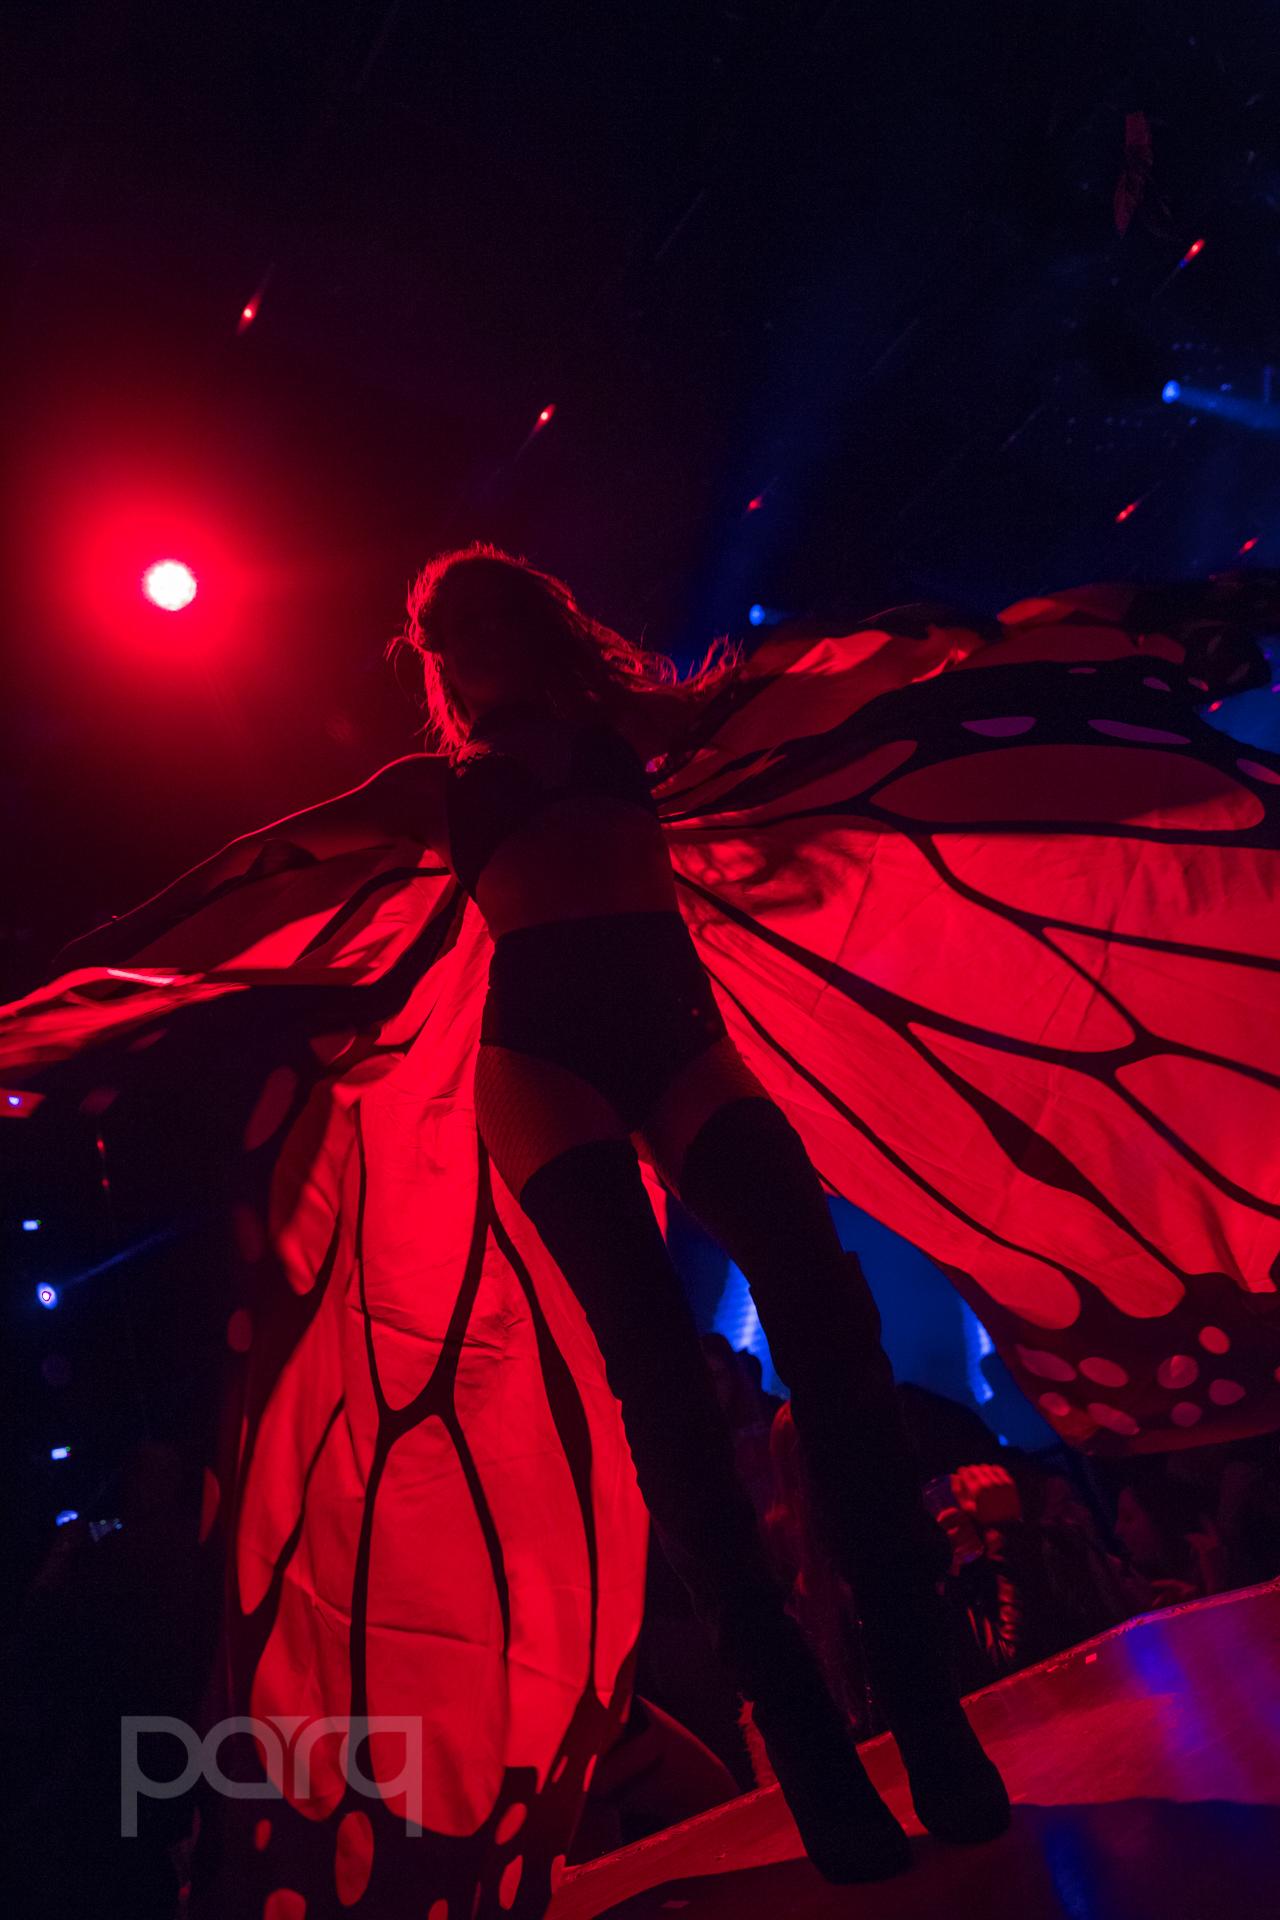 San-Diego-Nightclub-Zoo Funktion-18.jpg